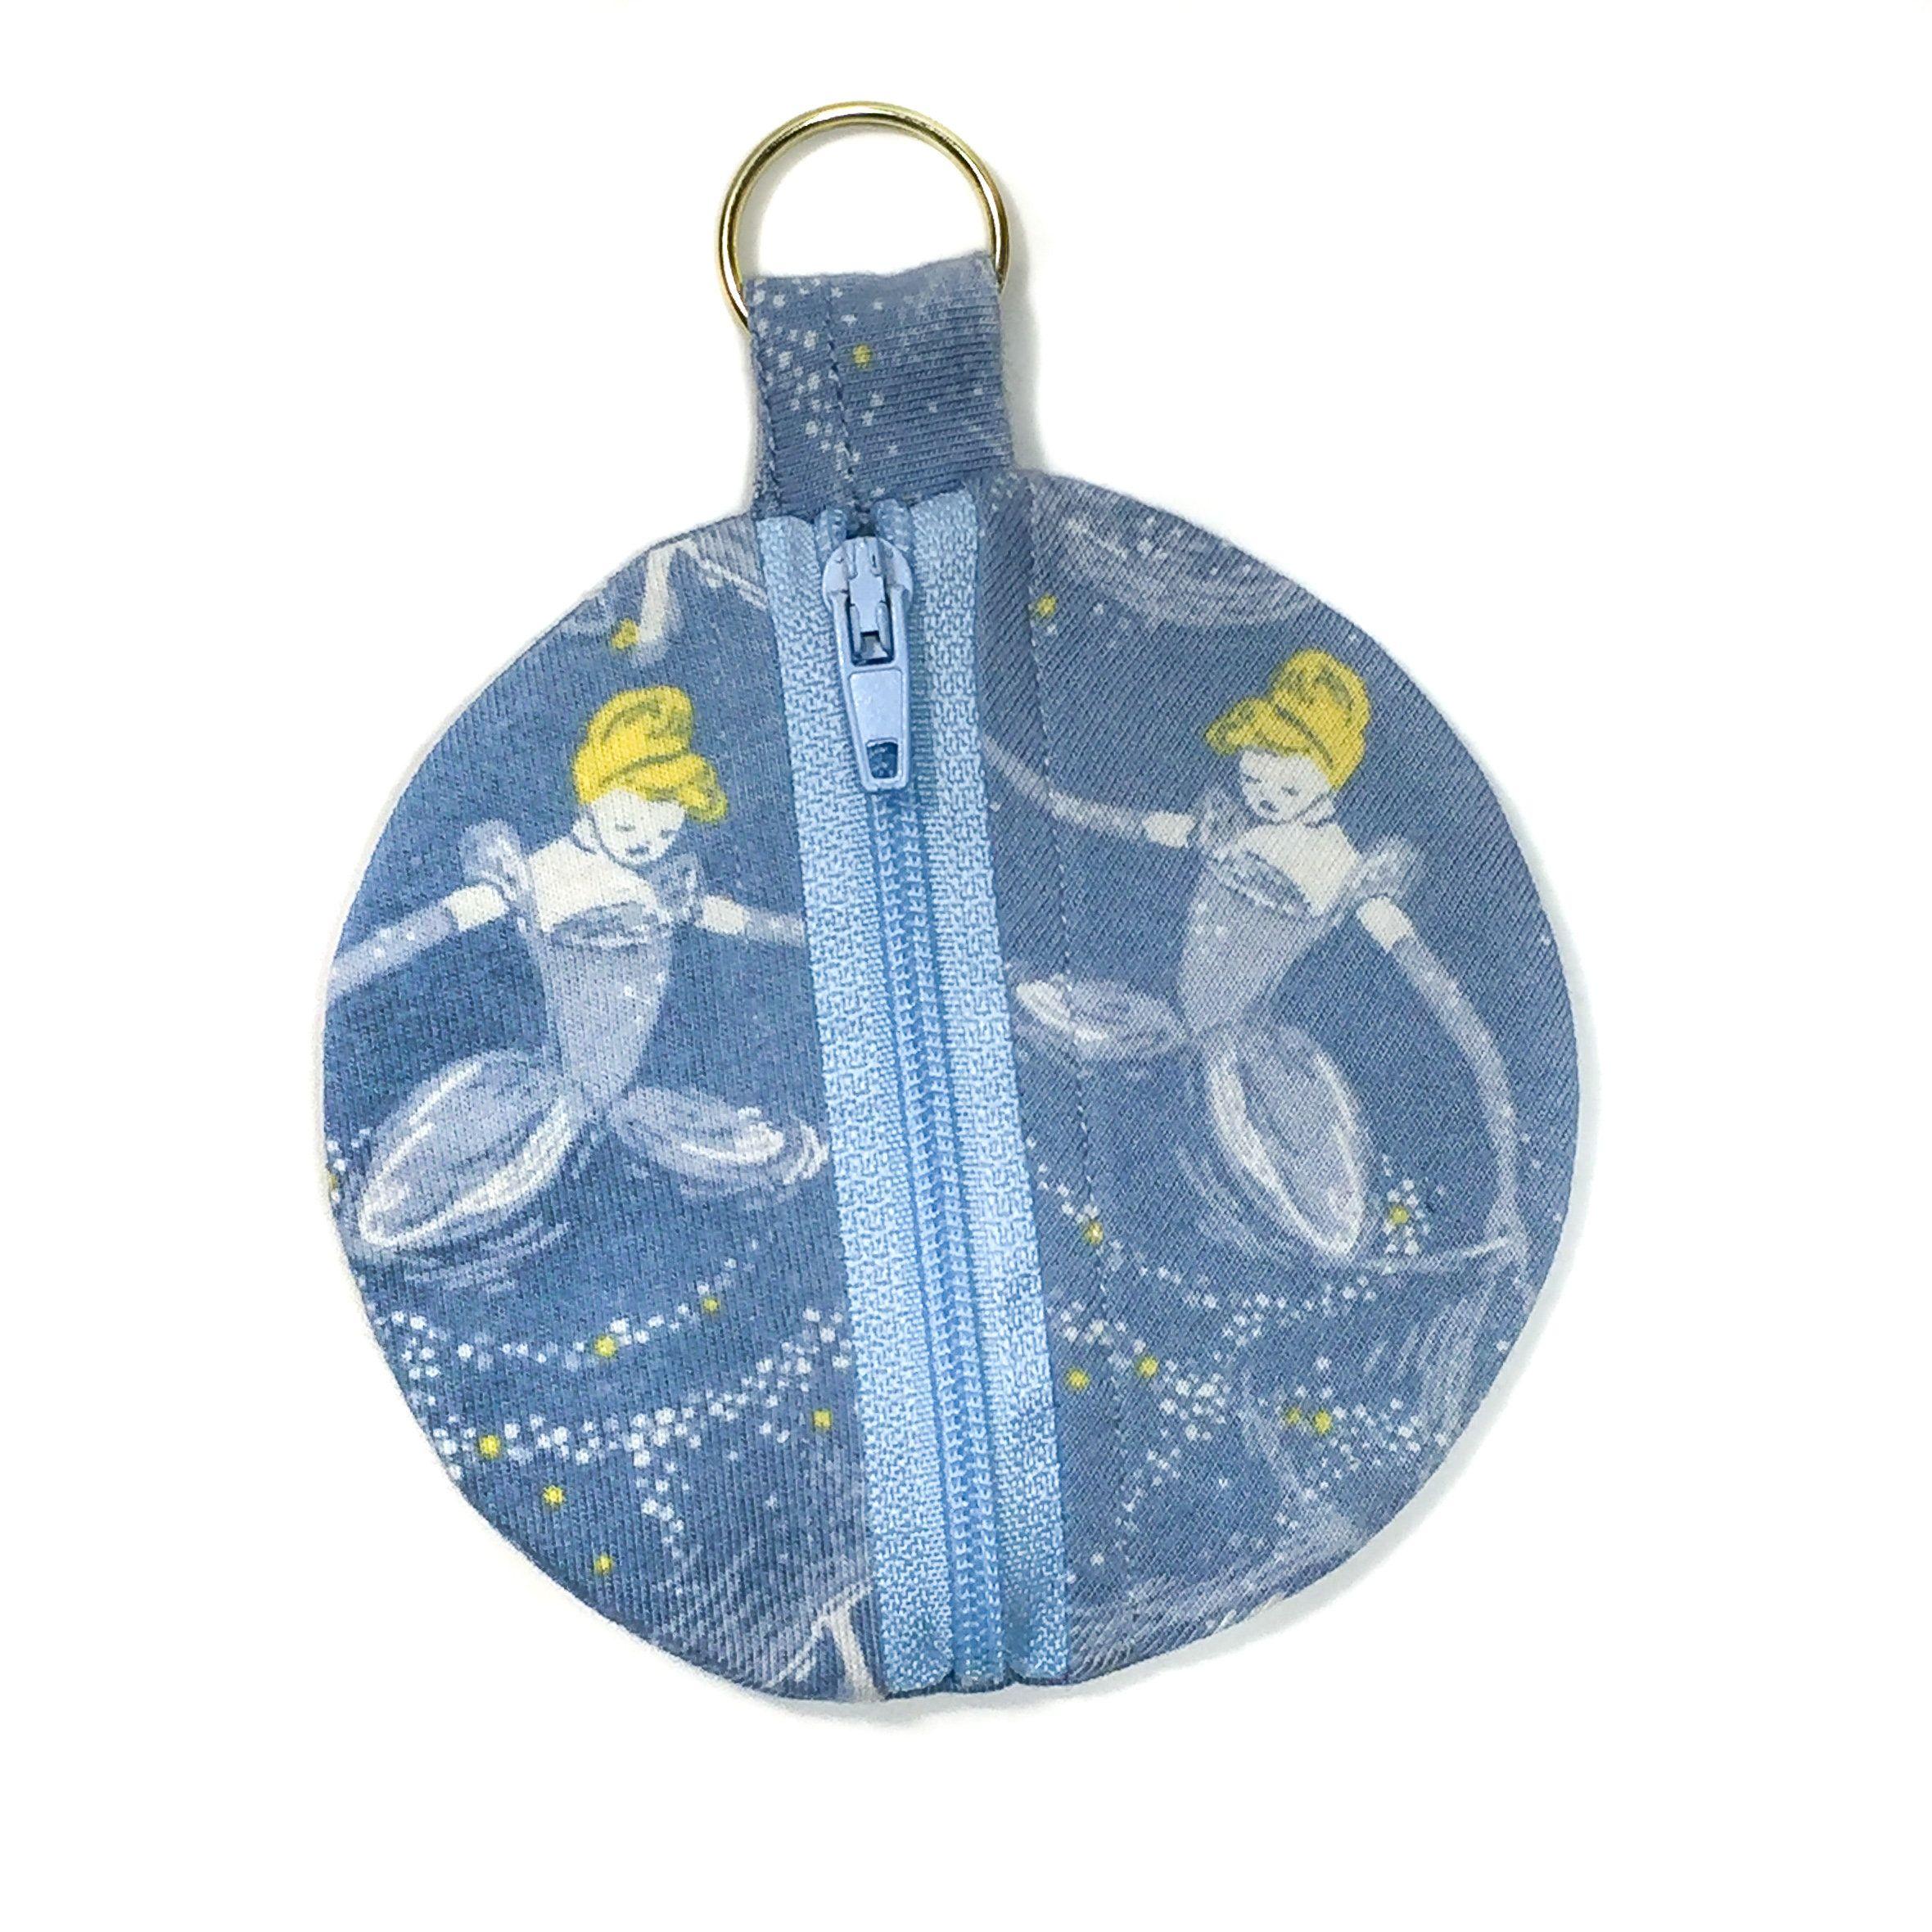 Disney airpod case airpod keychain disney headphone